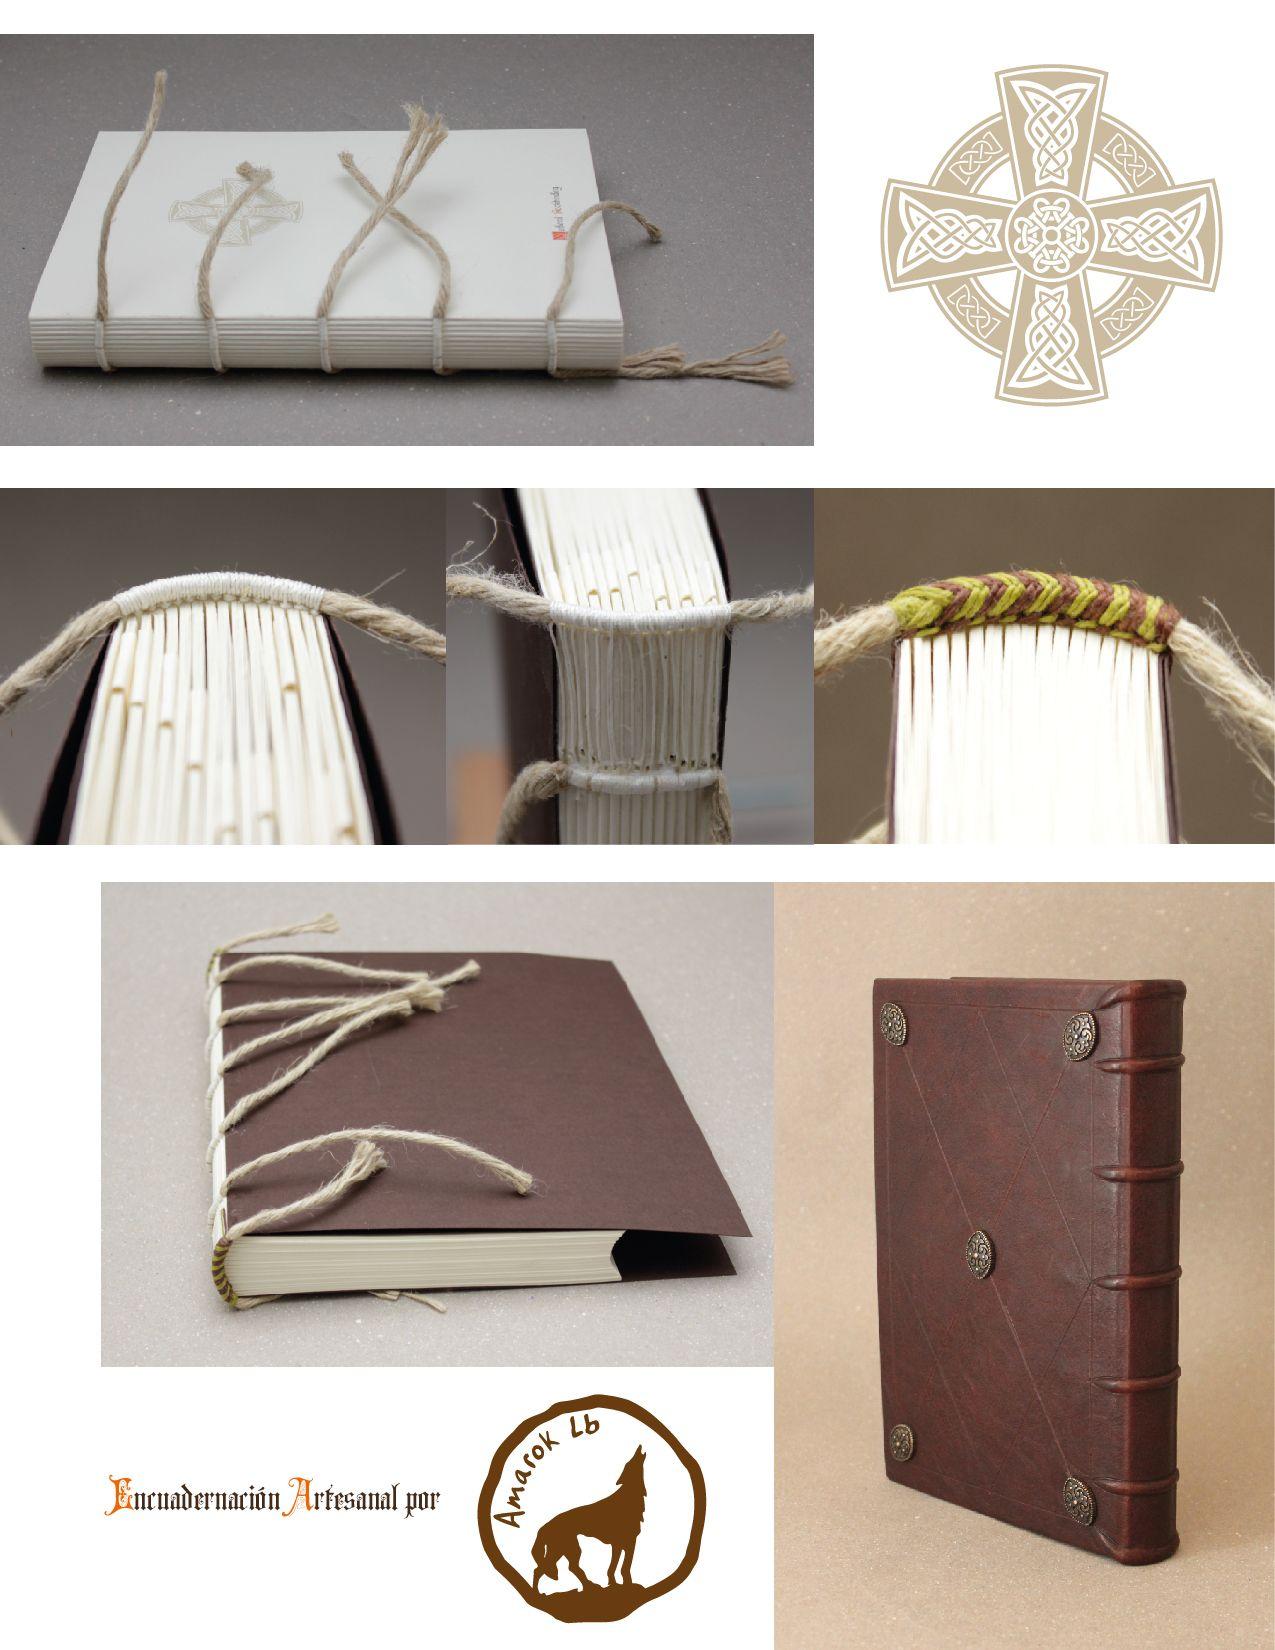 medieval bookbinding bookbinding buch binden buchbinderei buch selber binden. Black Bedroom Furniture Sets. Home Design Ideas